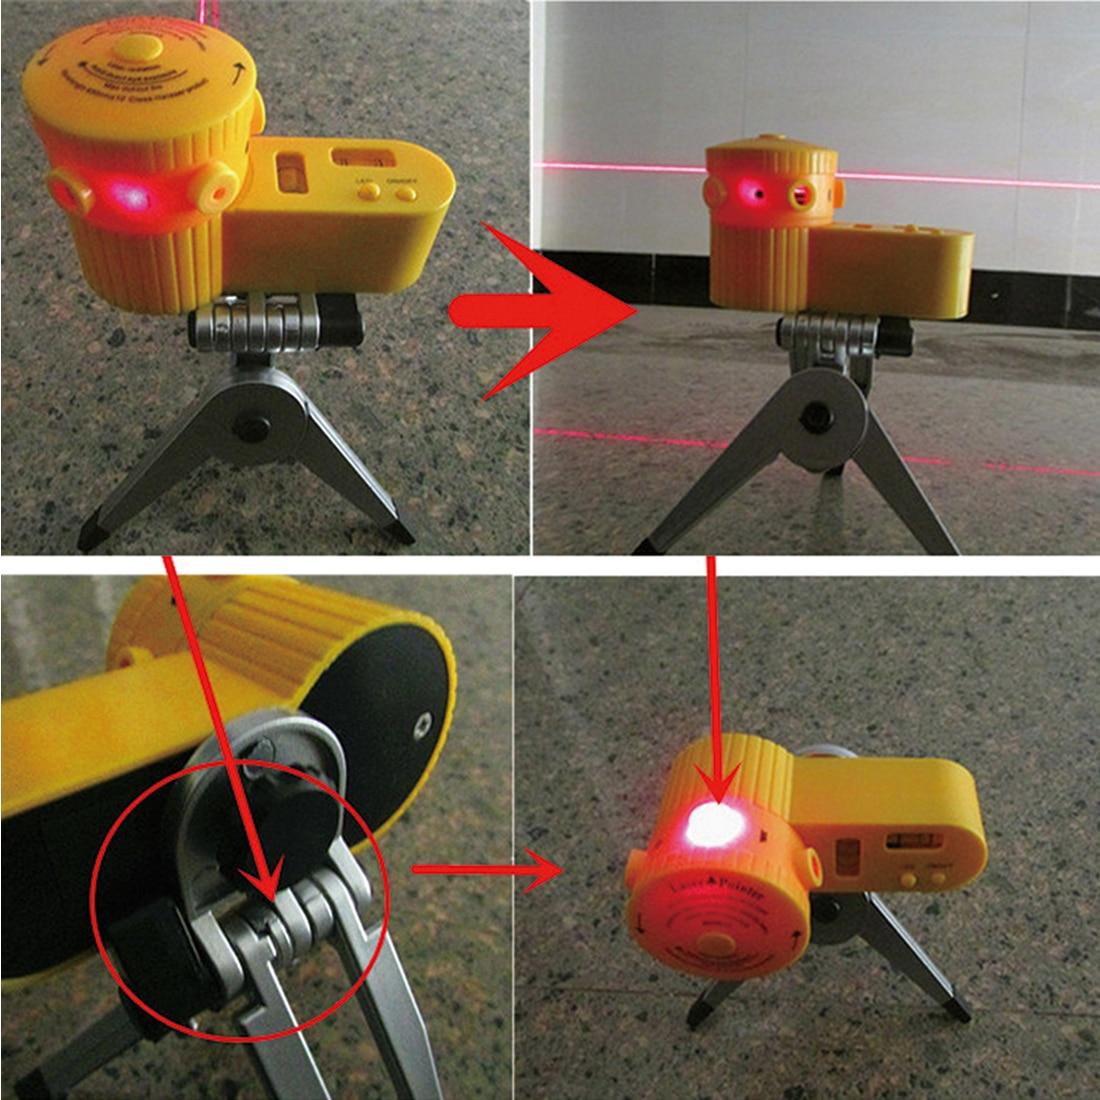 Multifunktions Kreuz Linie Werkzeug Gerät LED Laser Ebene Vertikale Horizontale Ausrüstung Mess Tool Mit Stativ